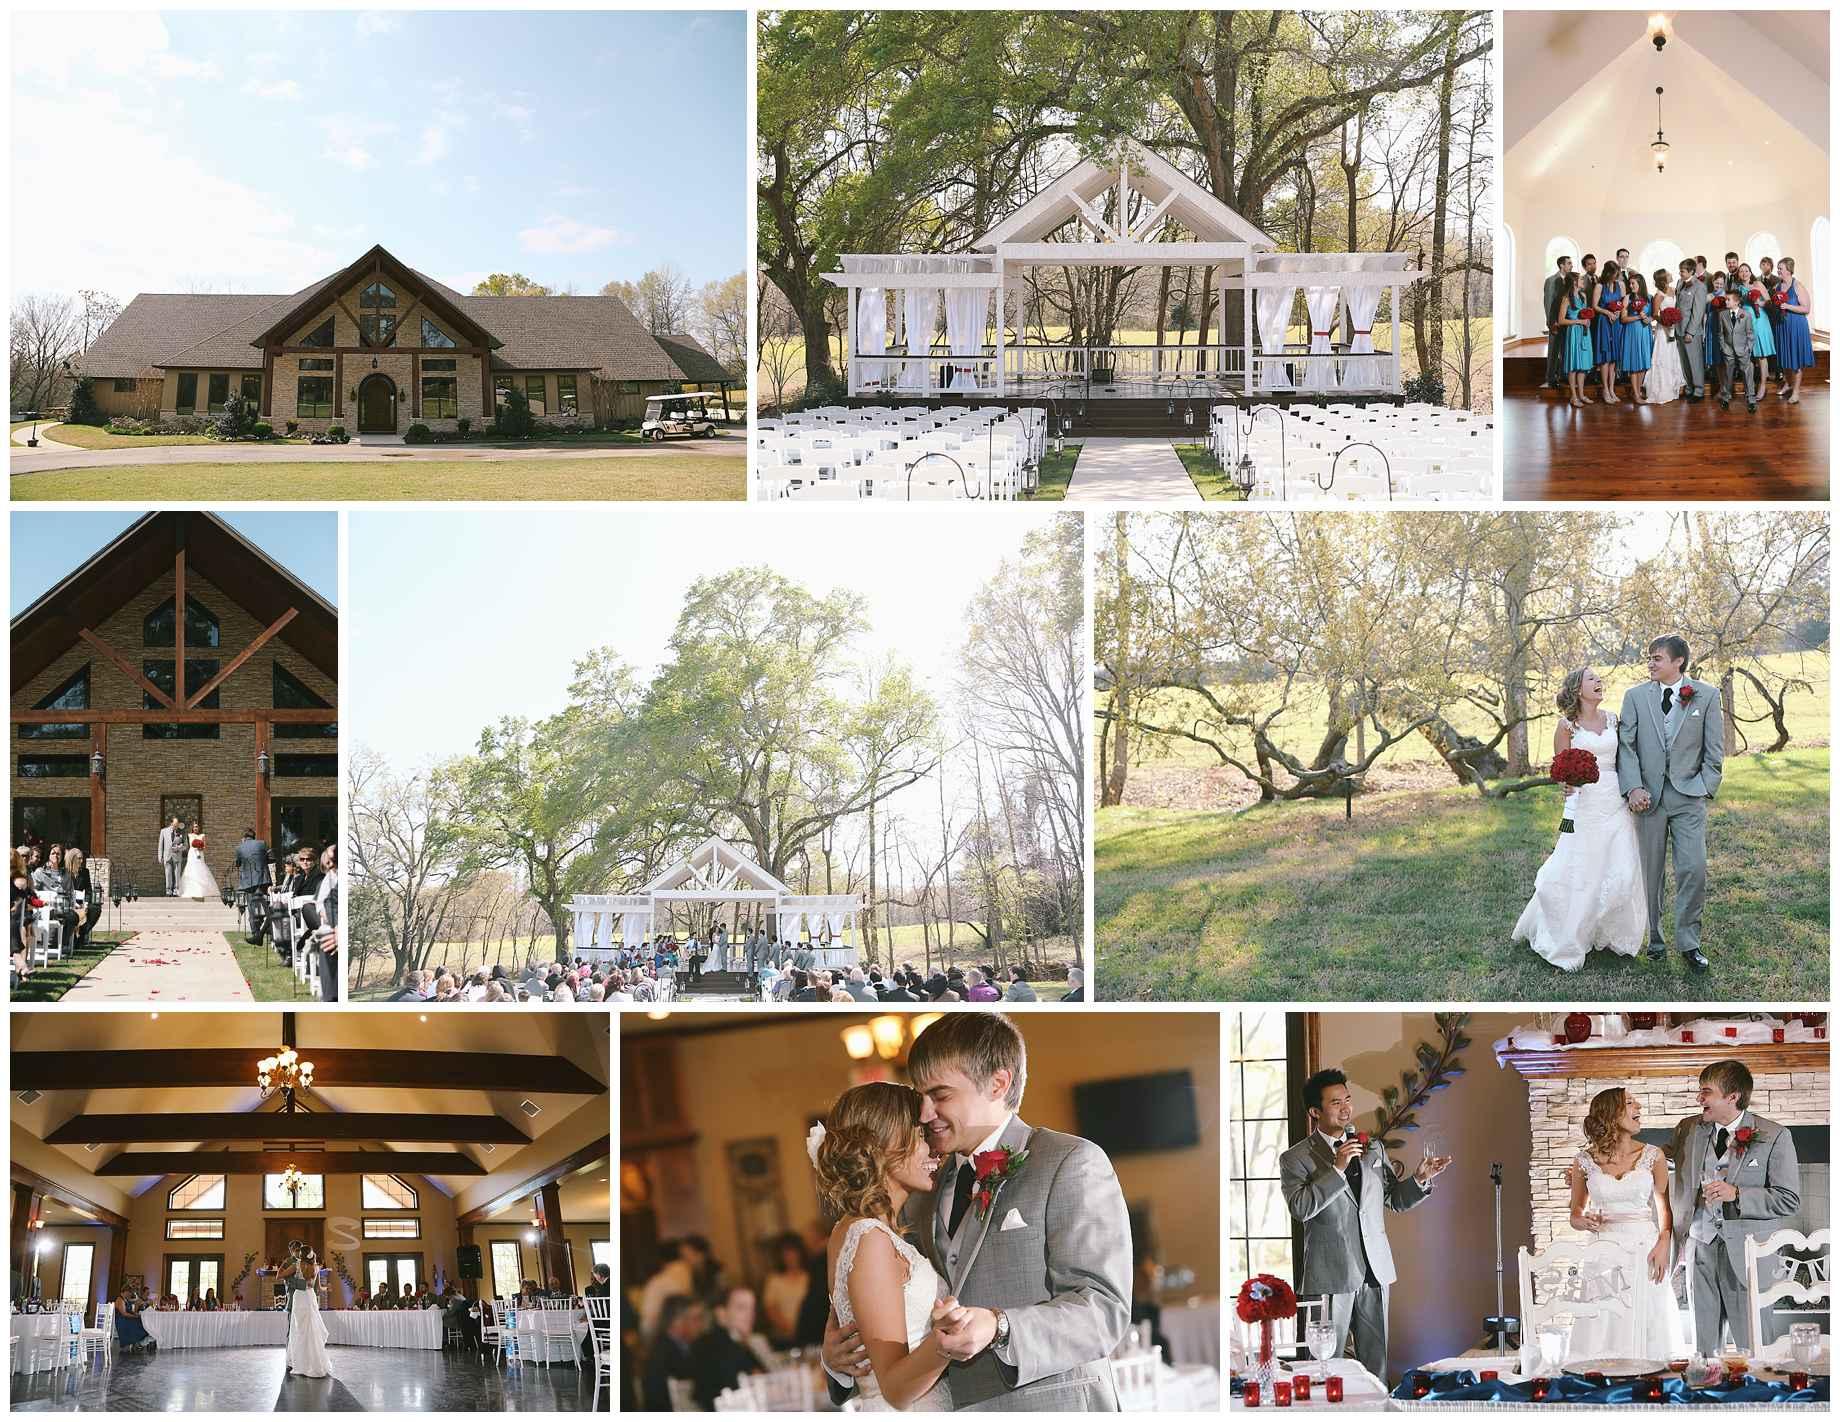 Top10easttexasweddingvenuesbellasera: Small Wedding Venues In Texas At Websimilar.org